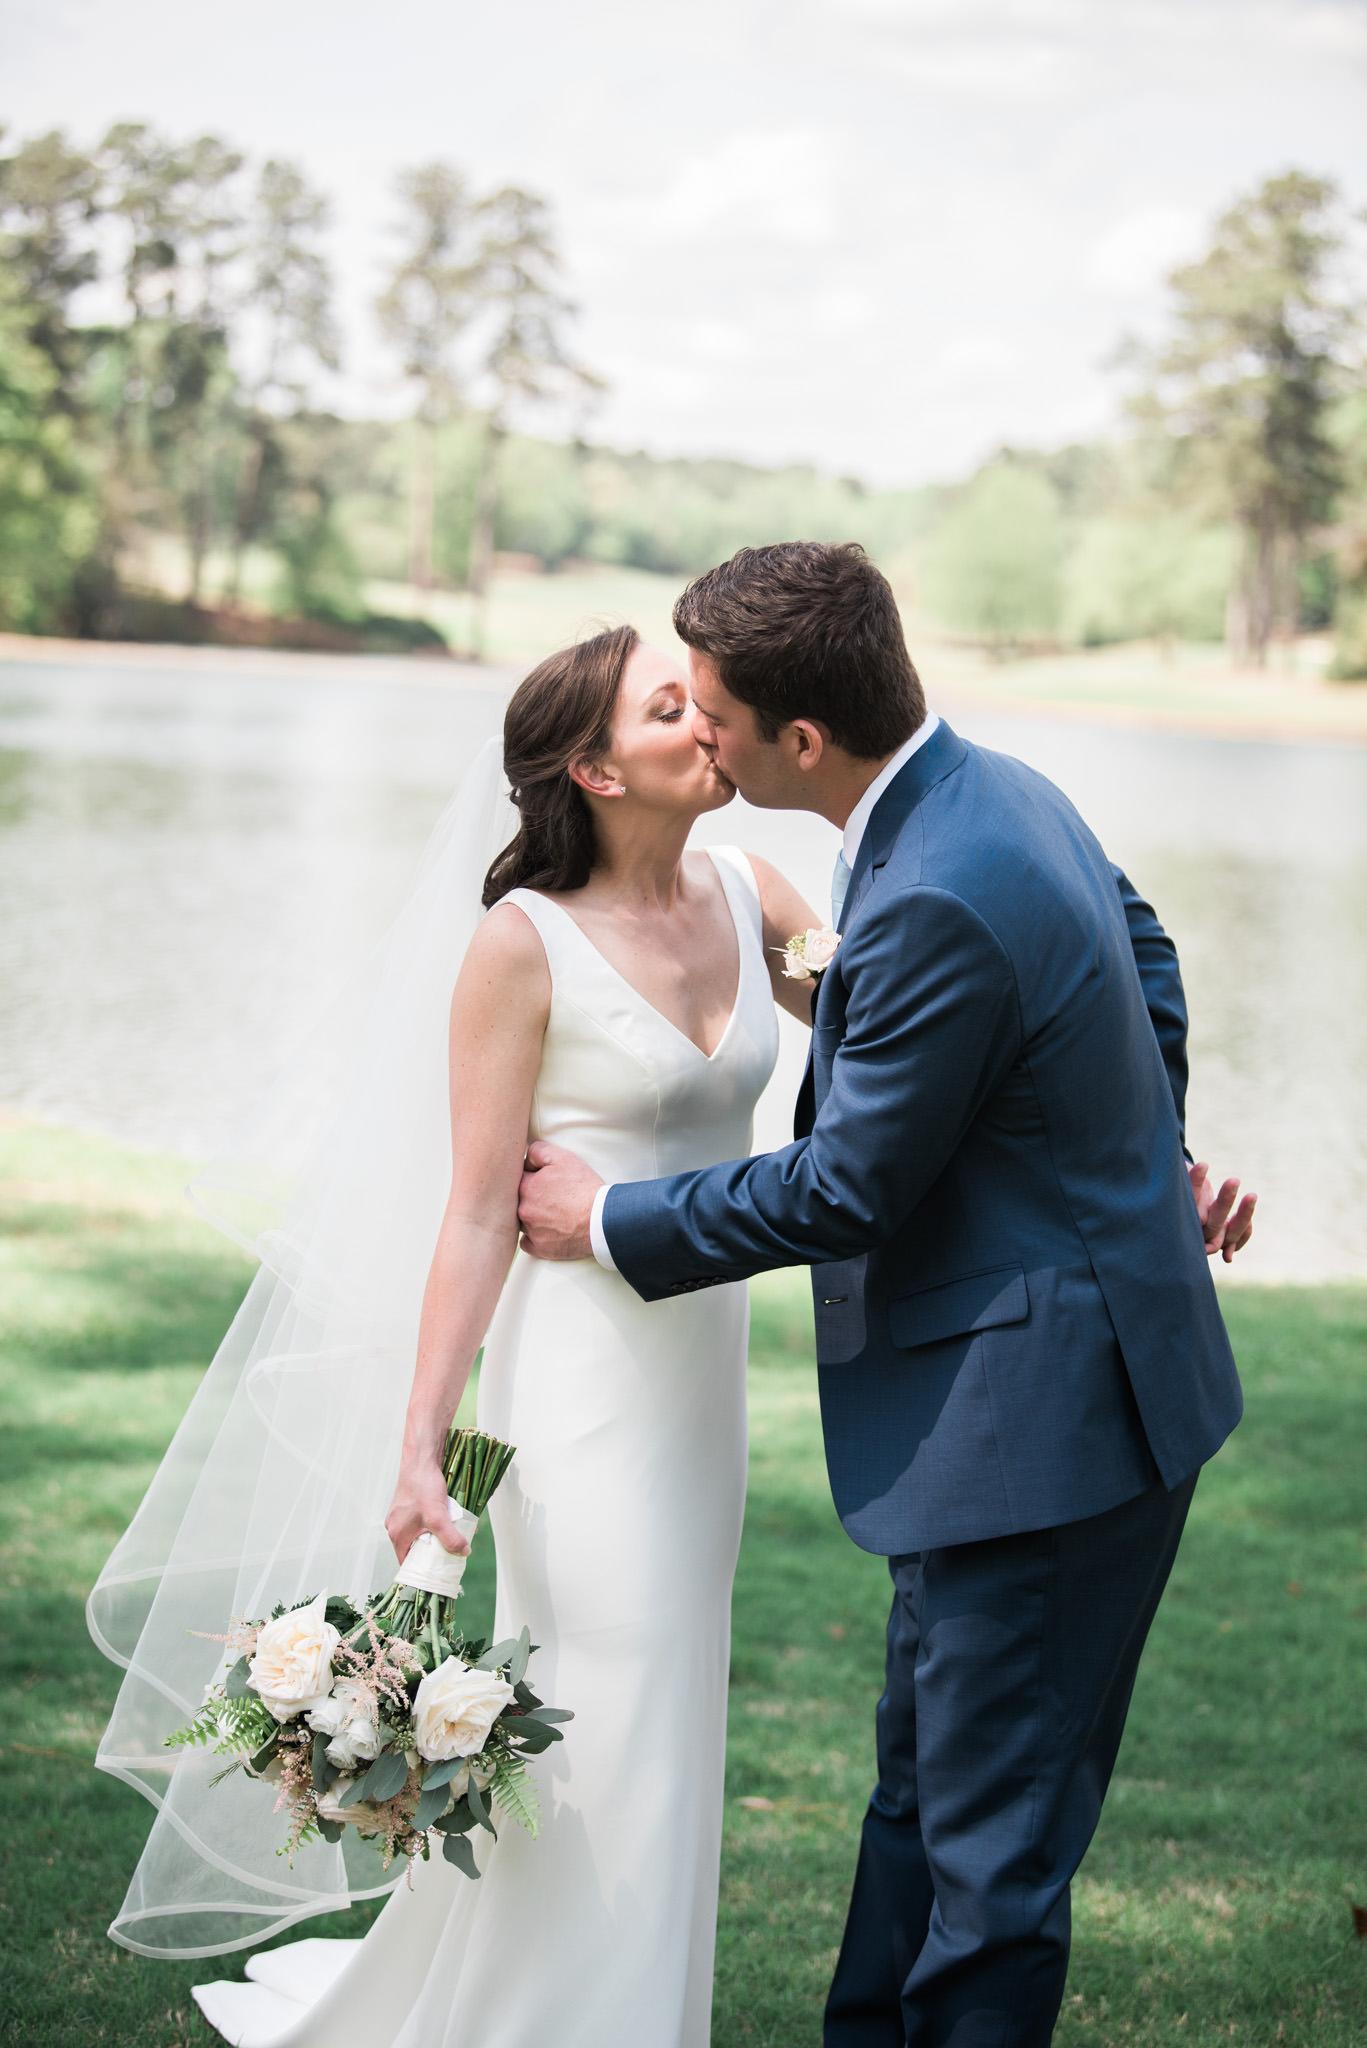 Athens-wedding-kiss-21.jpg